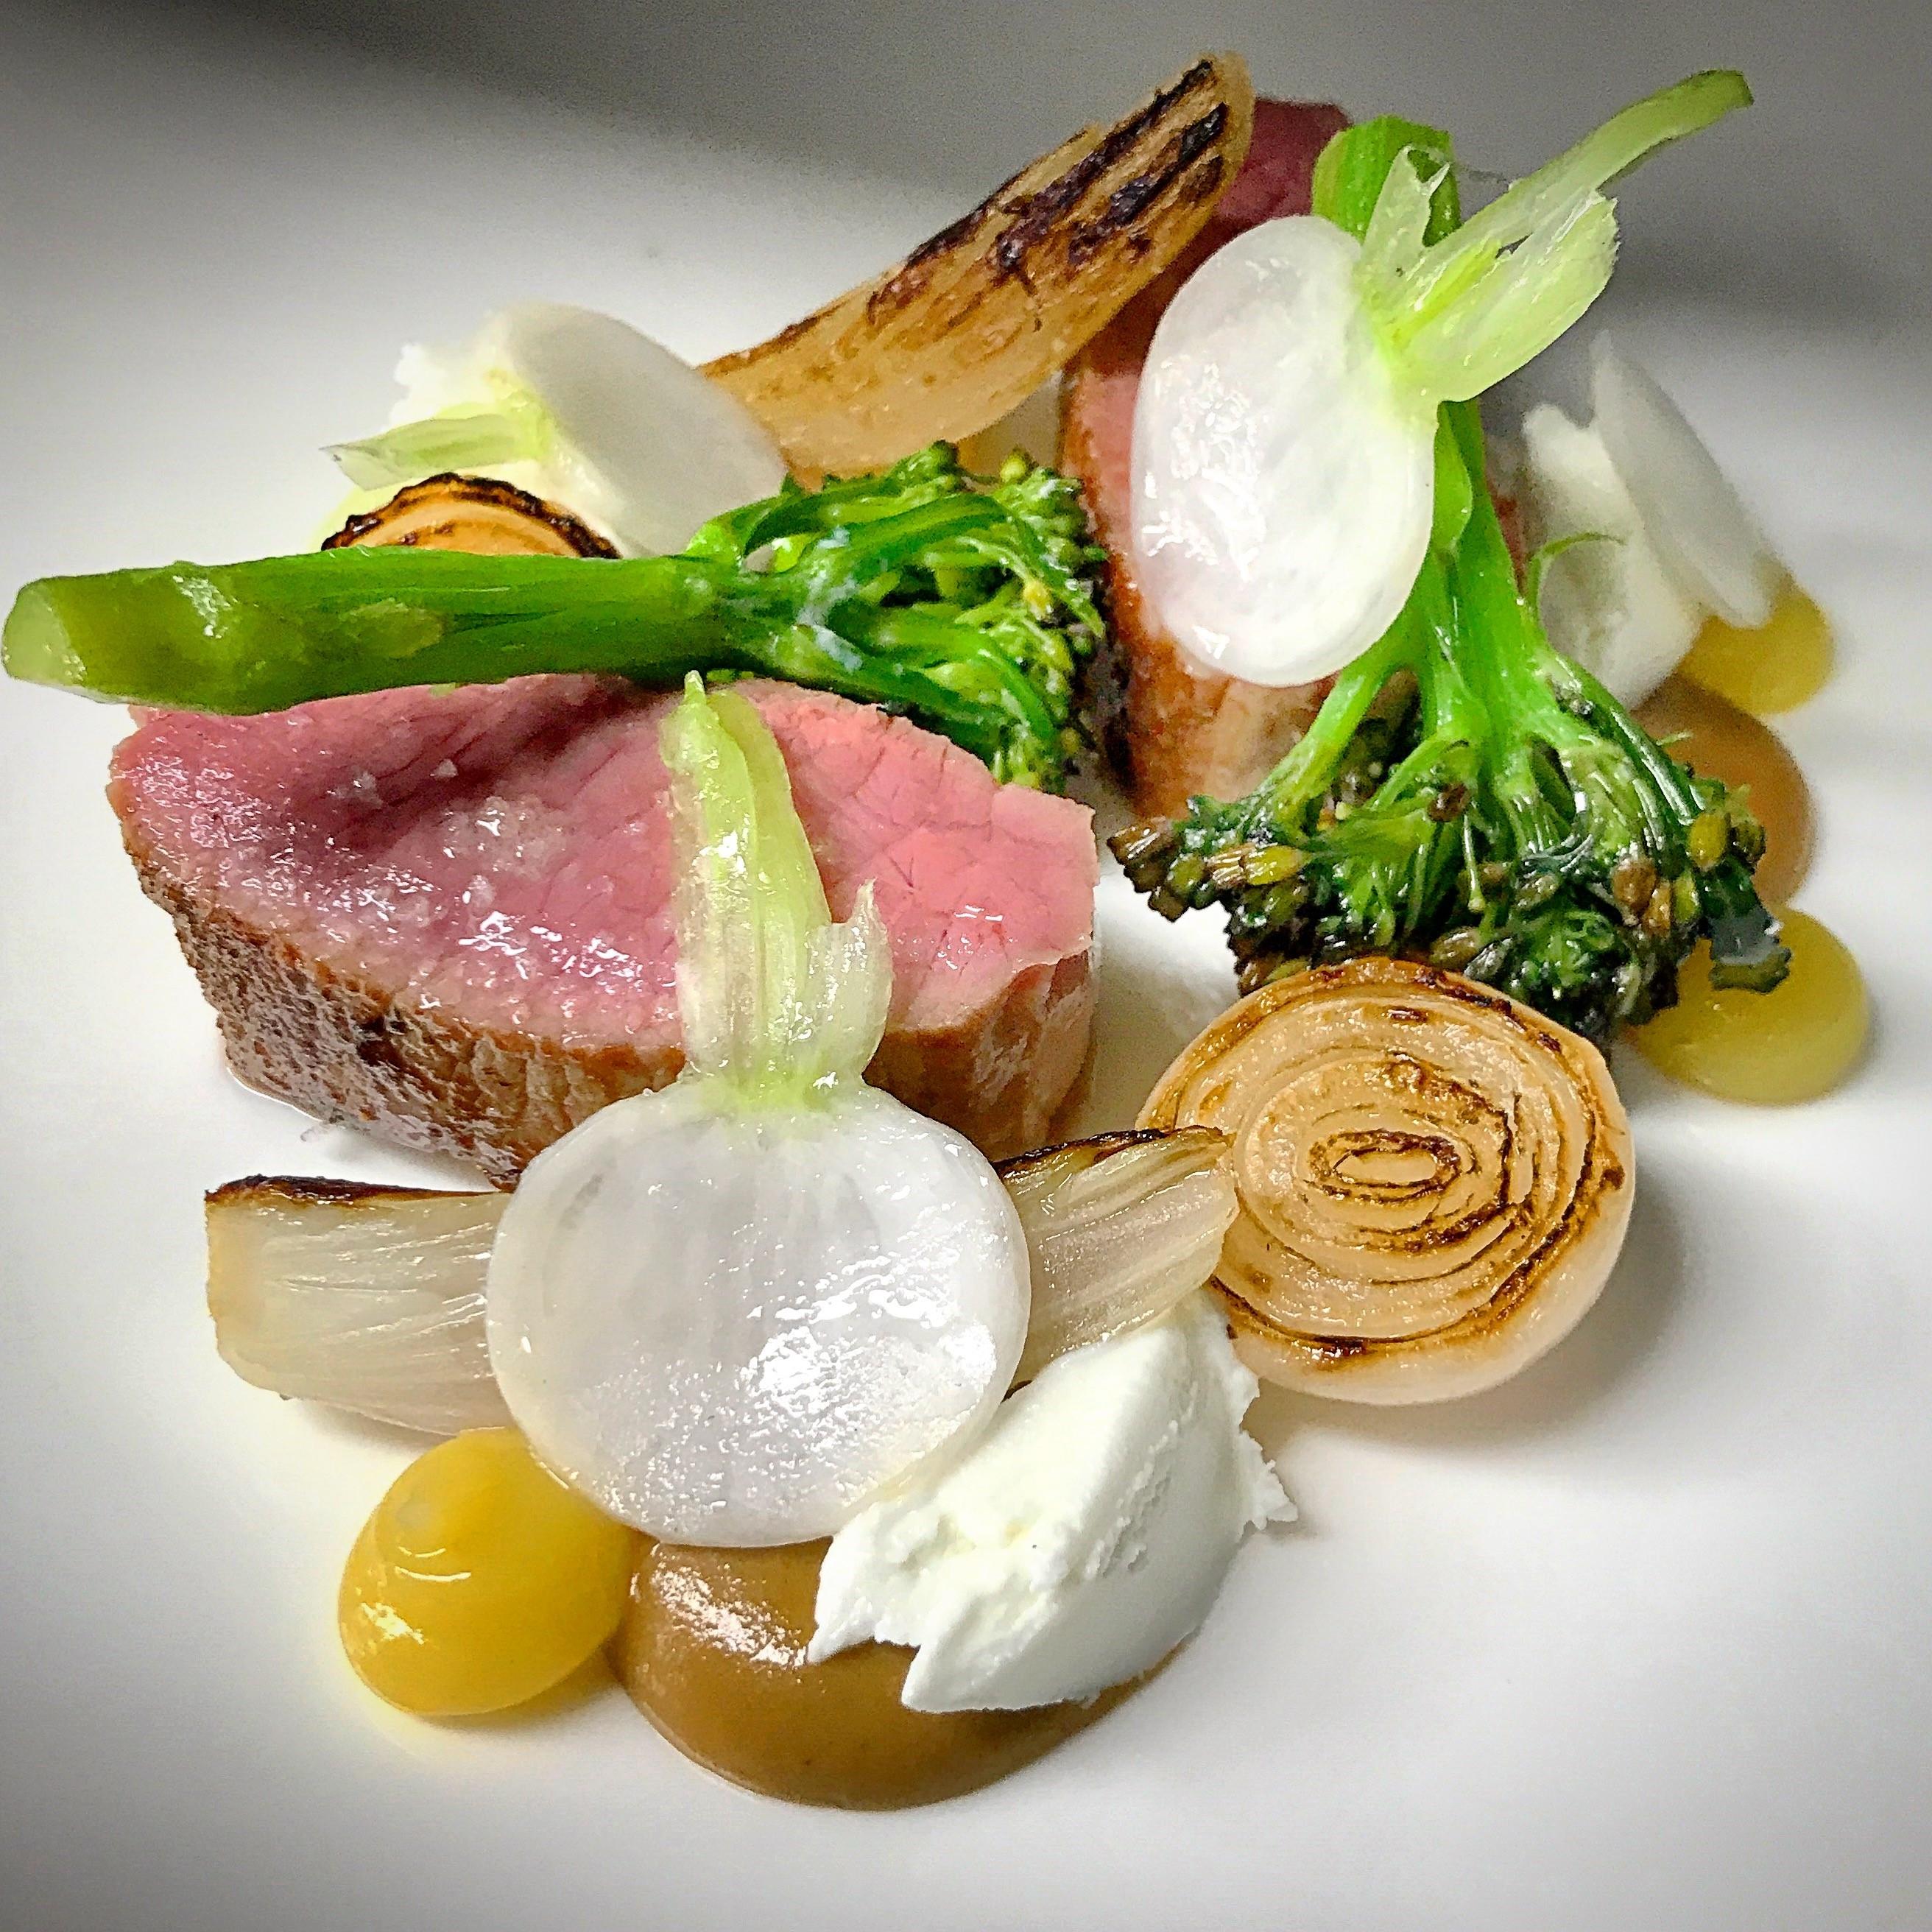 Herdwick Lamb, confit lemon, goats curd and onions by Tom Shepherd, head chef at Adam's Restaurant, Birmingham